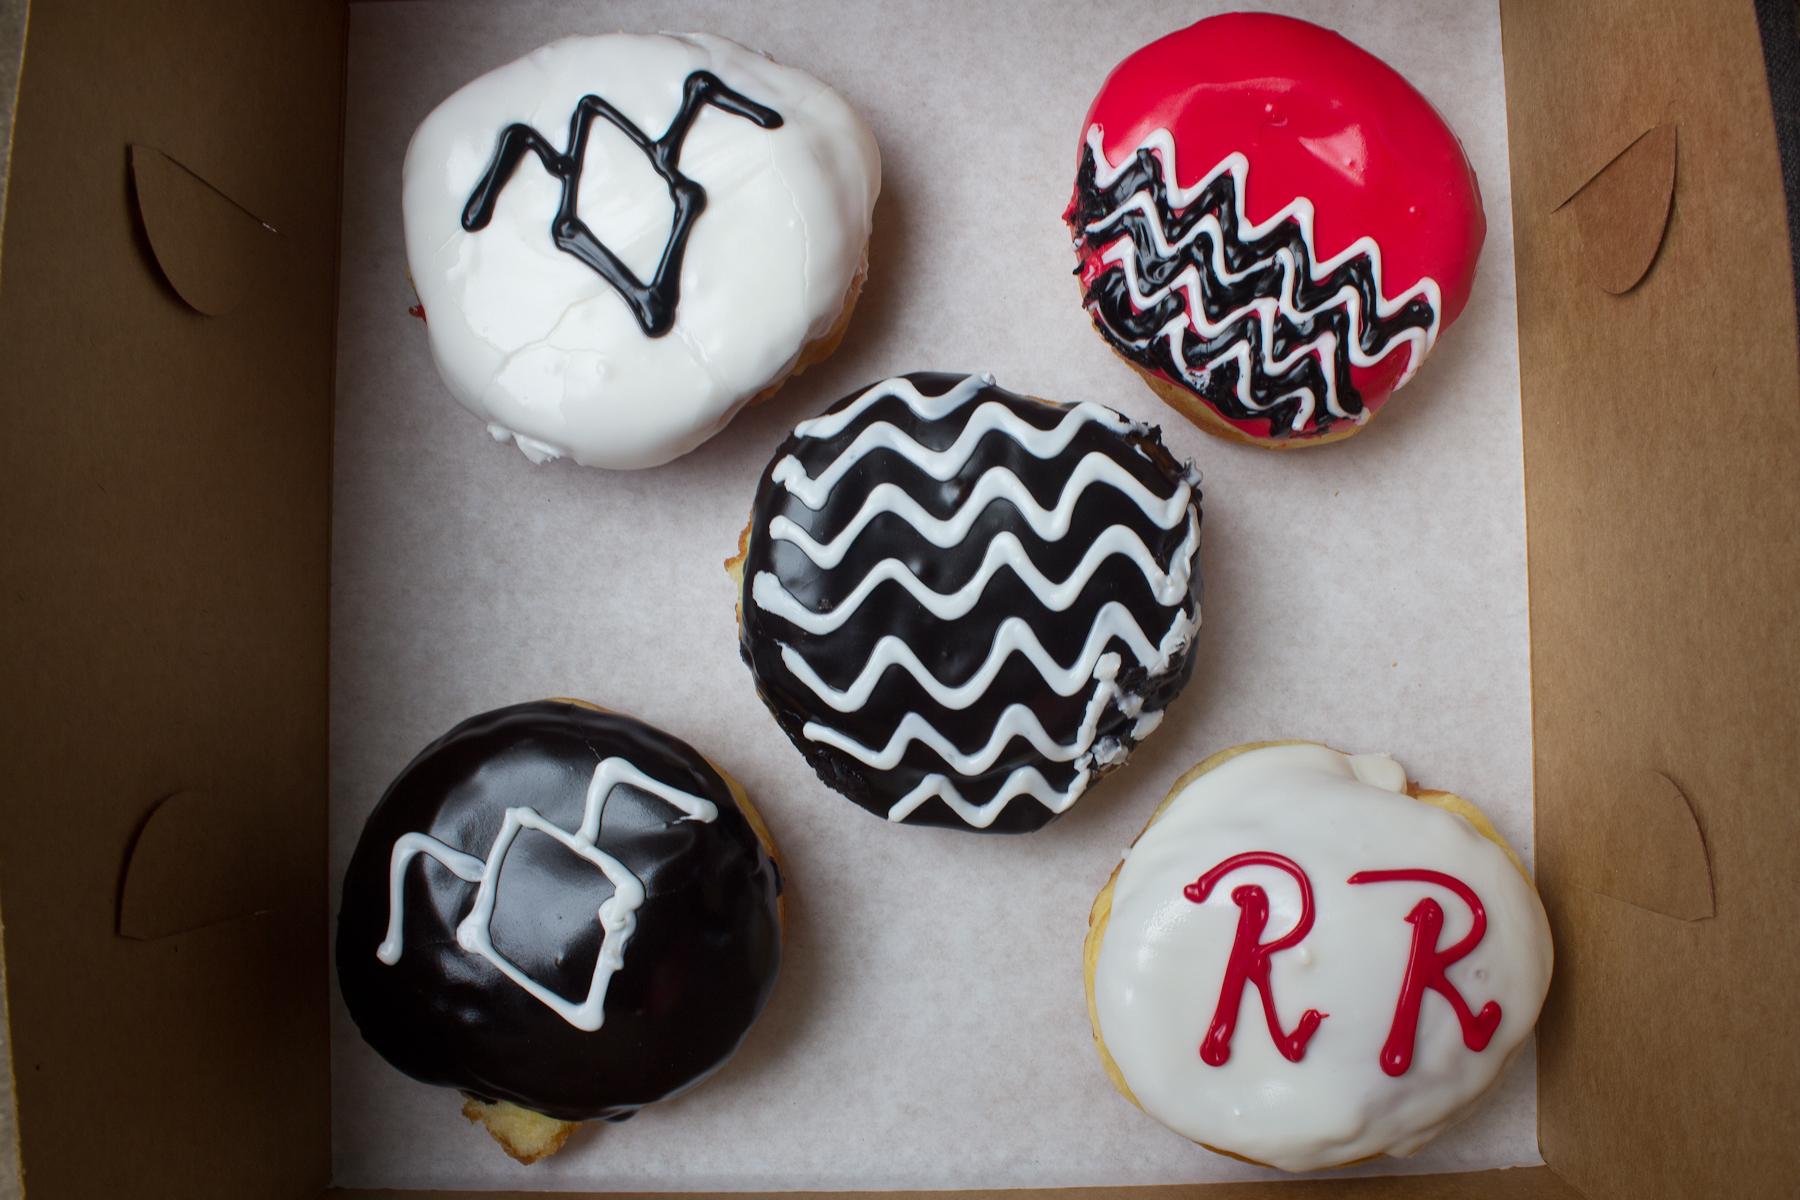 Voodoo Doughnuts' Twin Peaks doughnuts